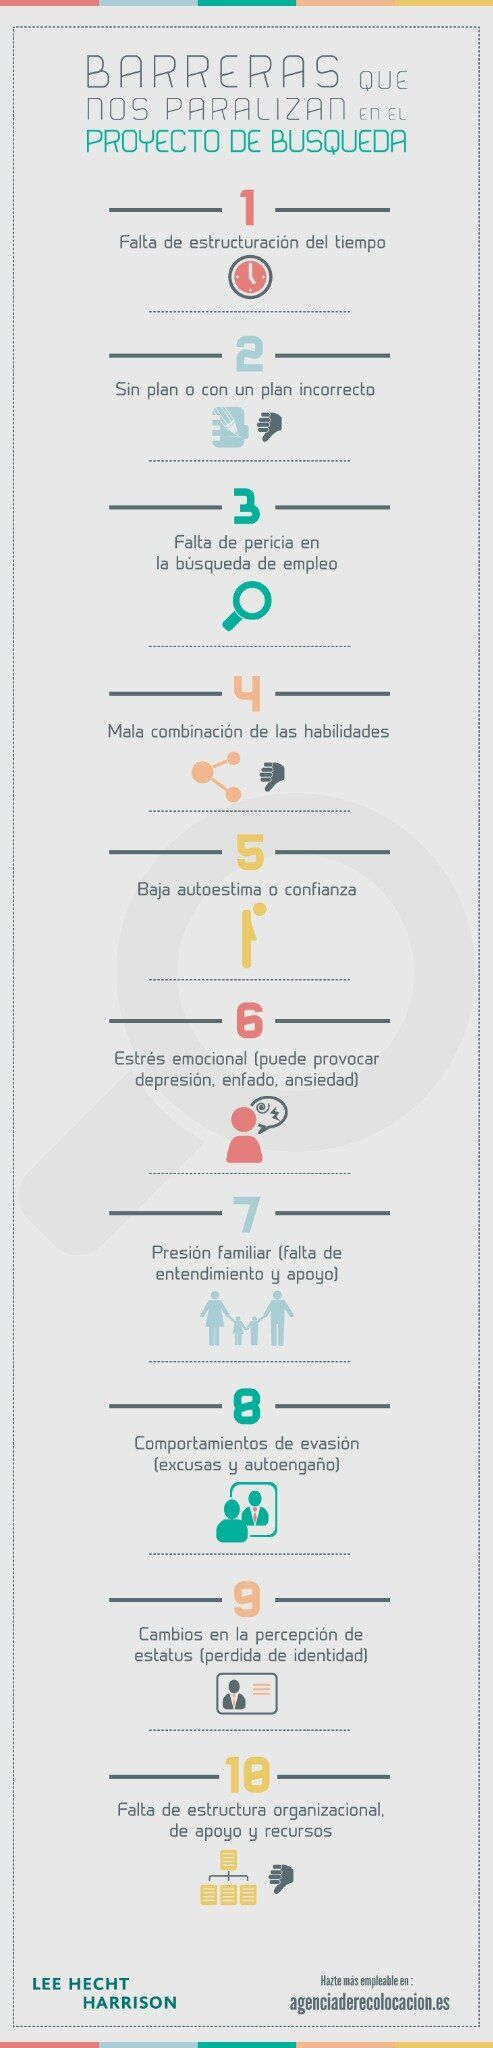 Barreras personales para la búsqueda de empleo #infografia #infographic